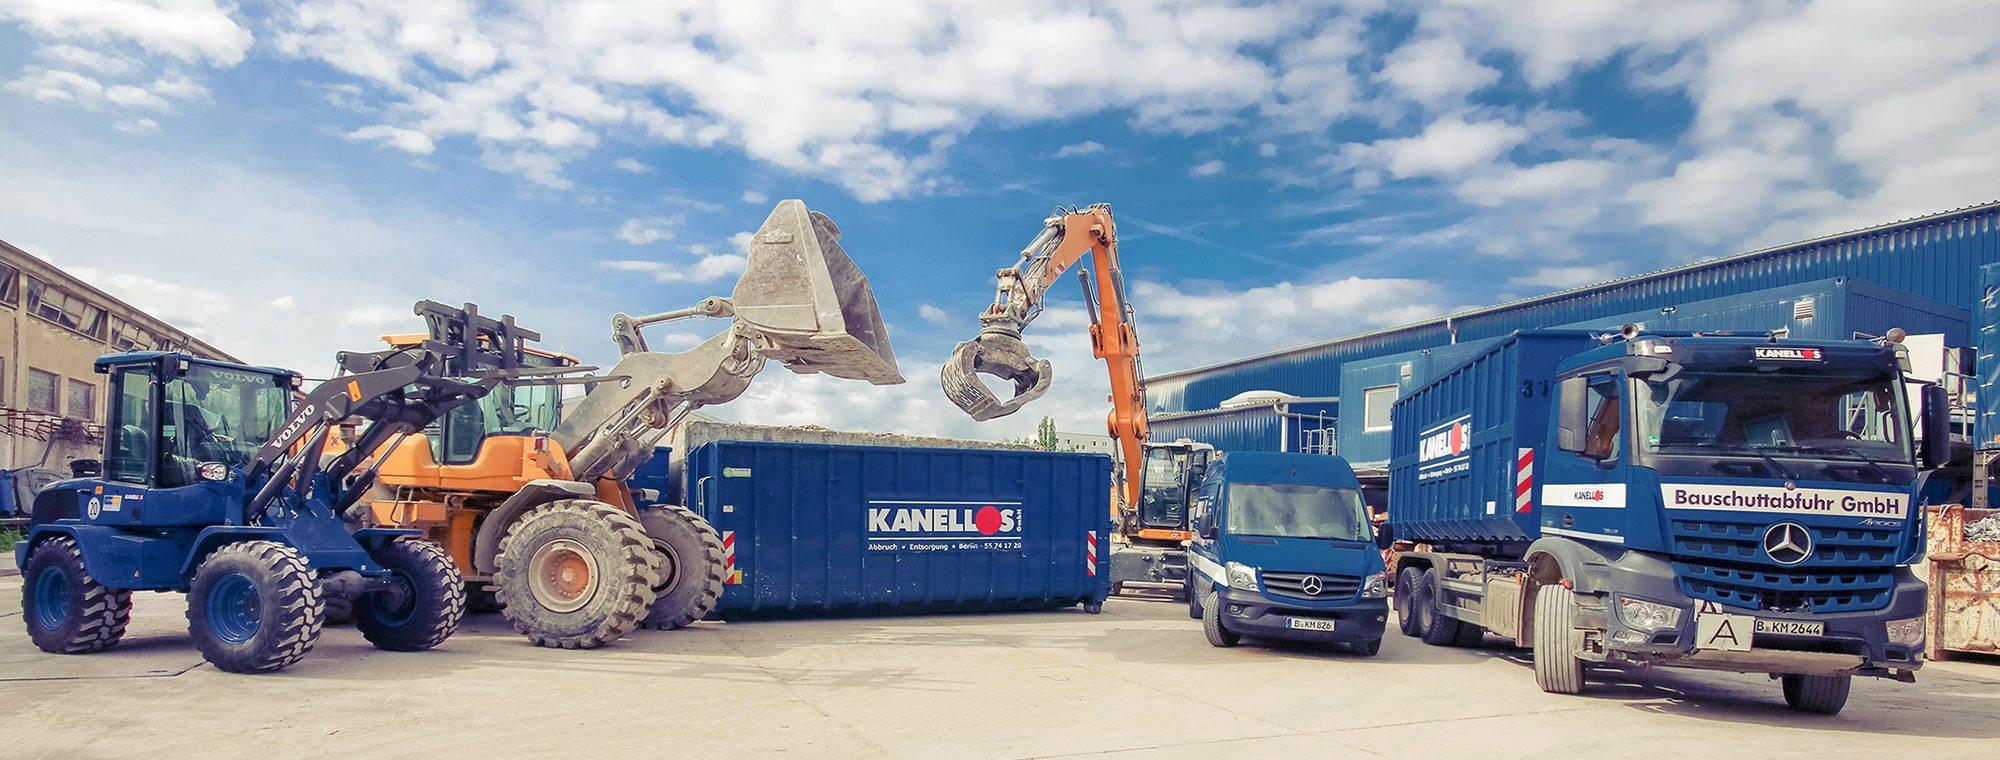 Header Kanellos GmbH